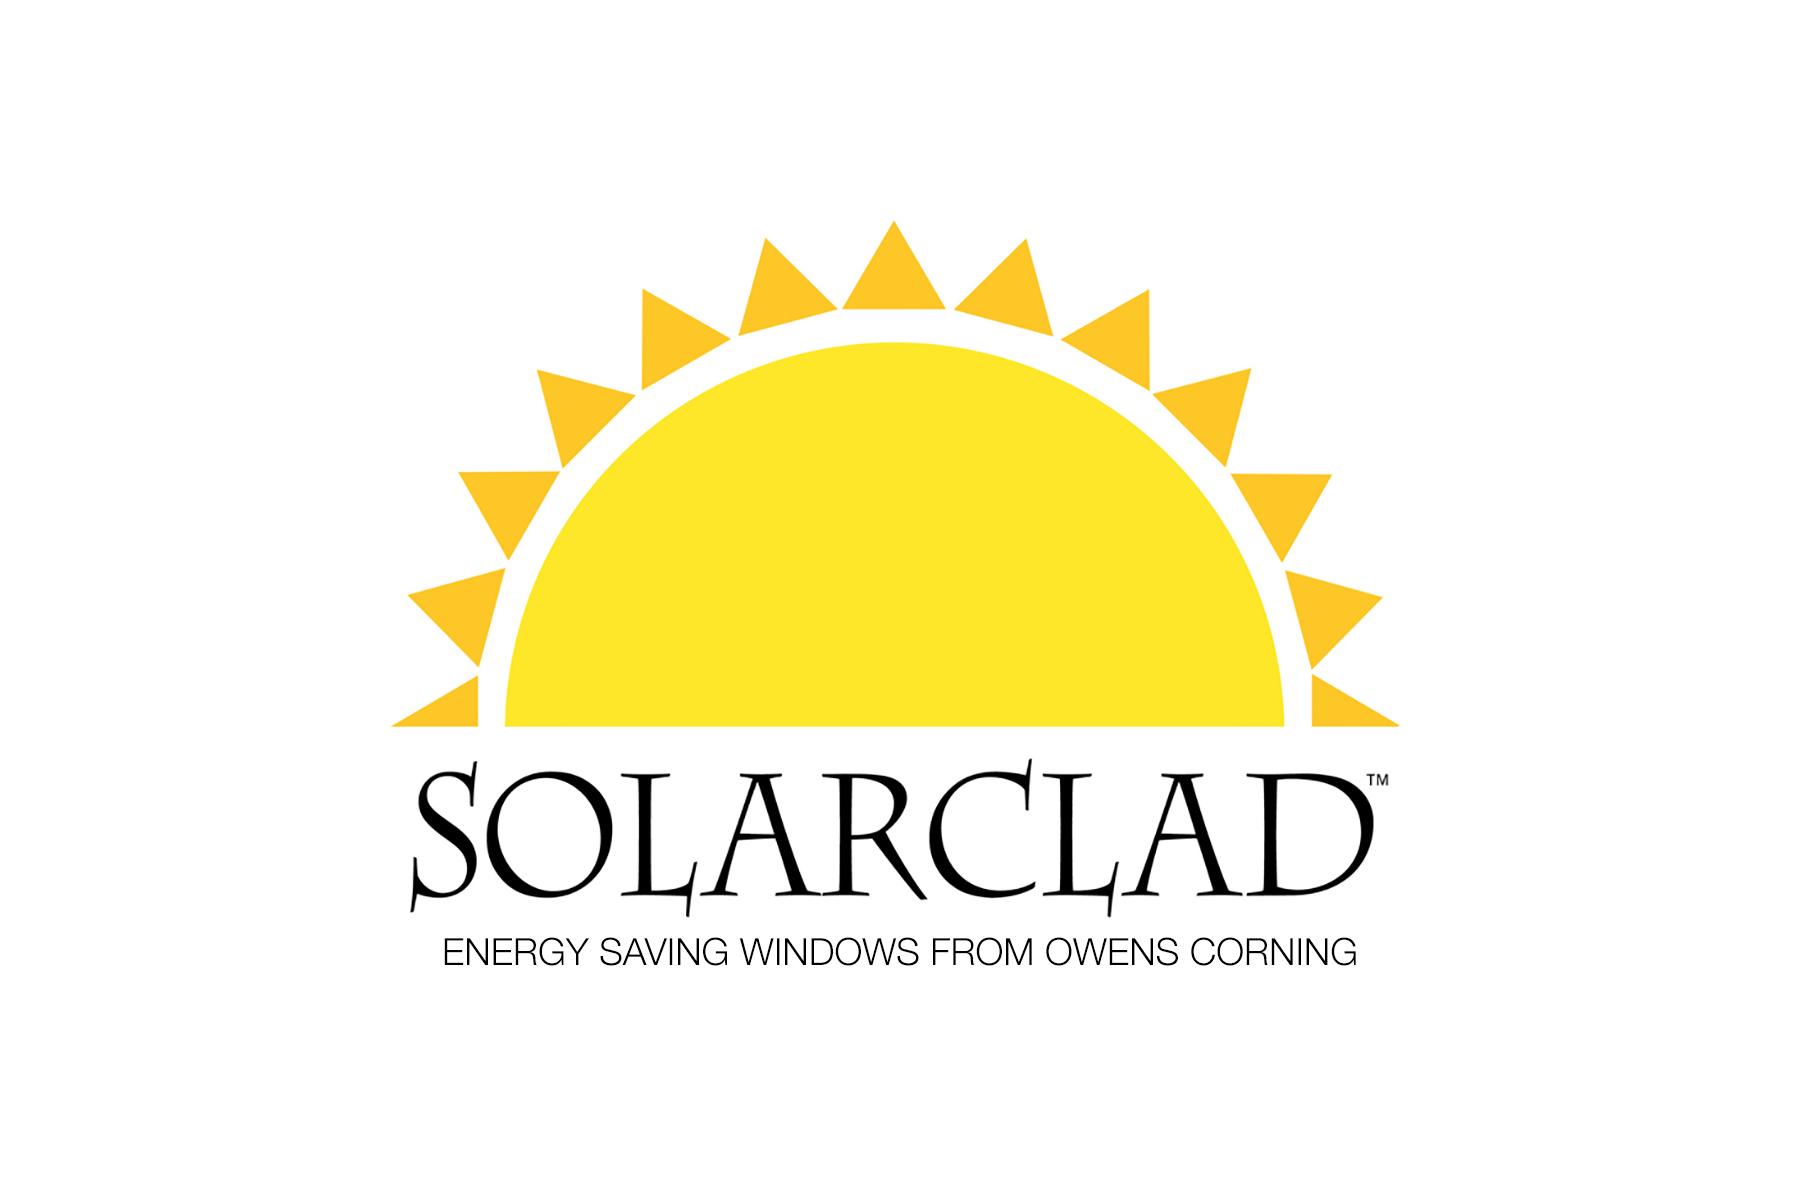 logo-06-solarclad.jpg